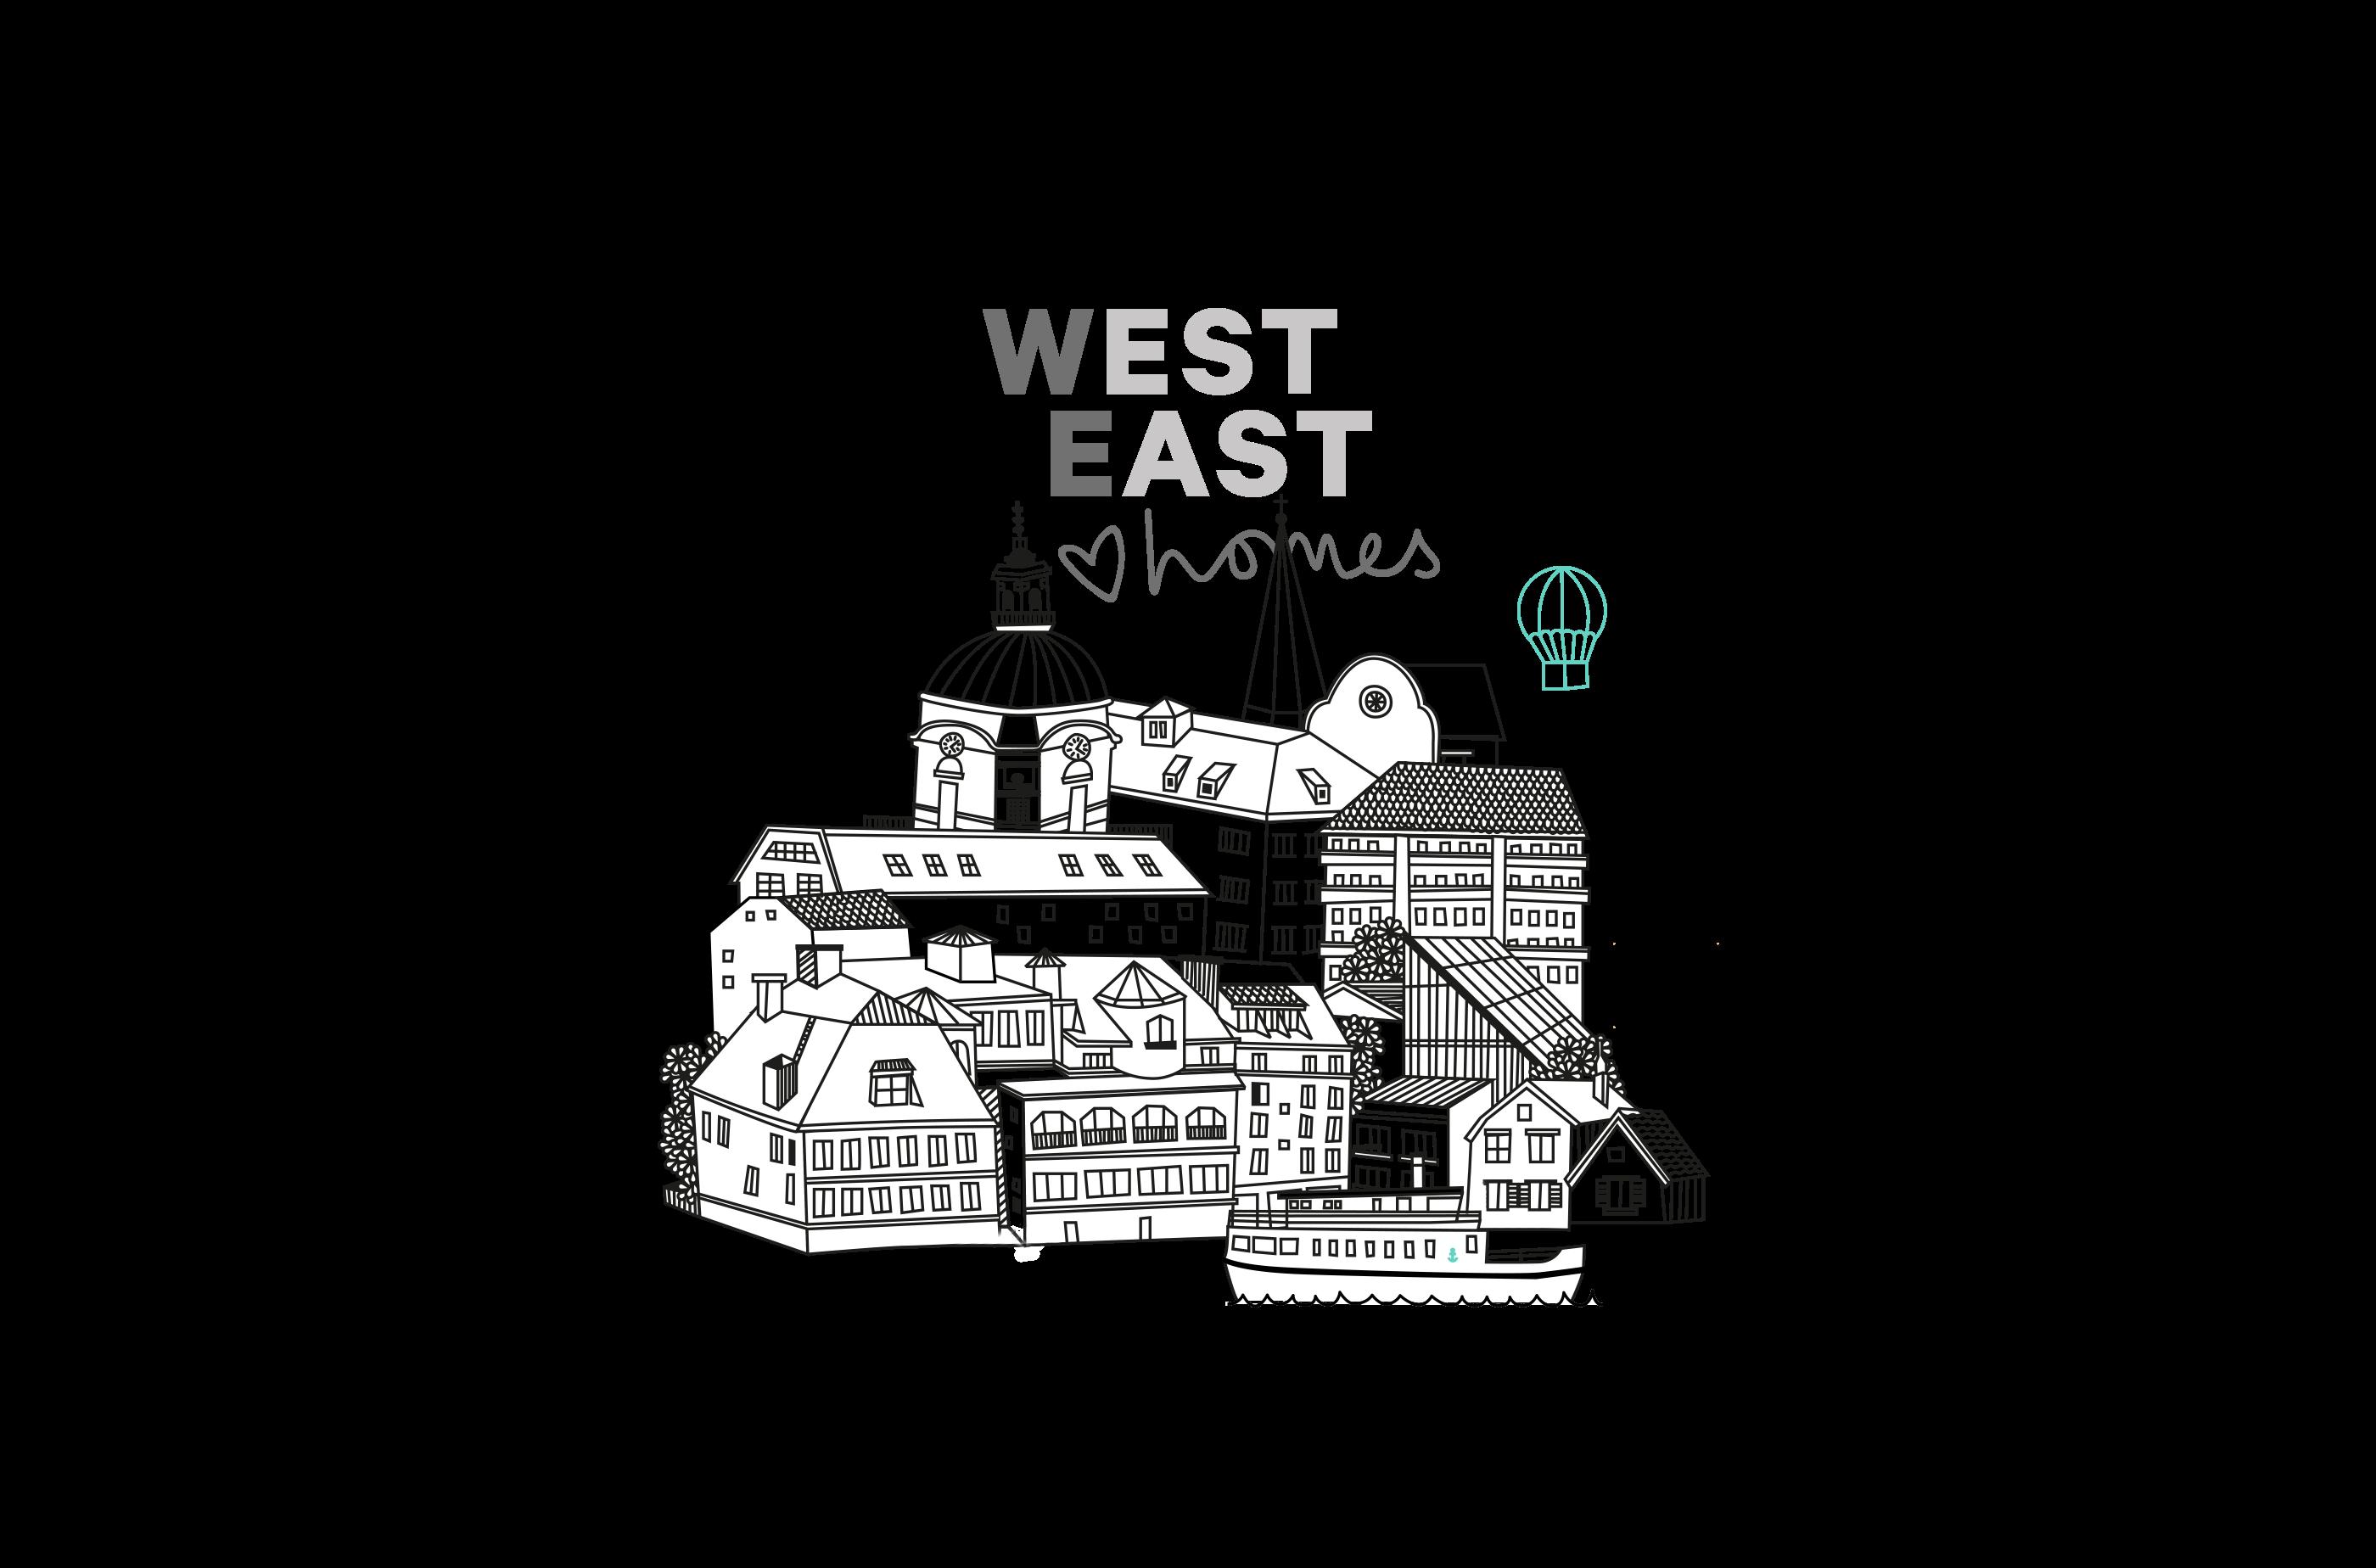 West East logo